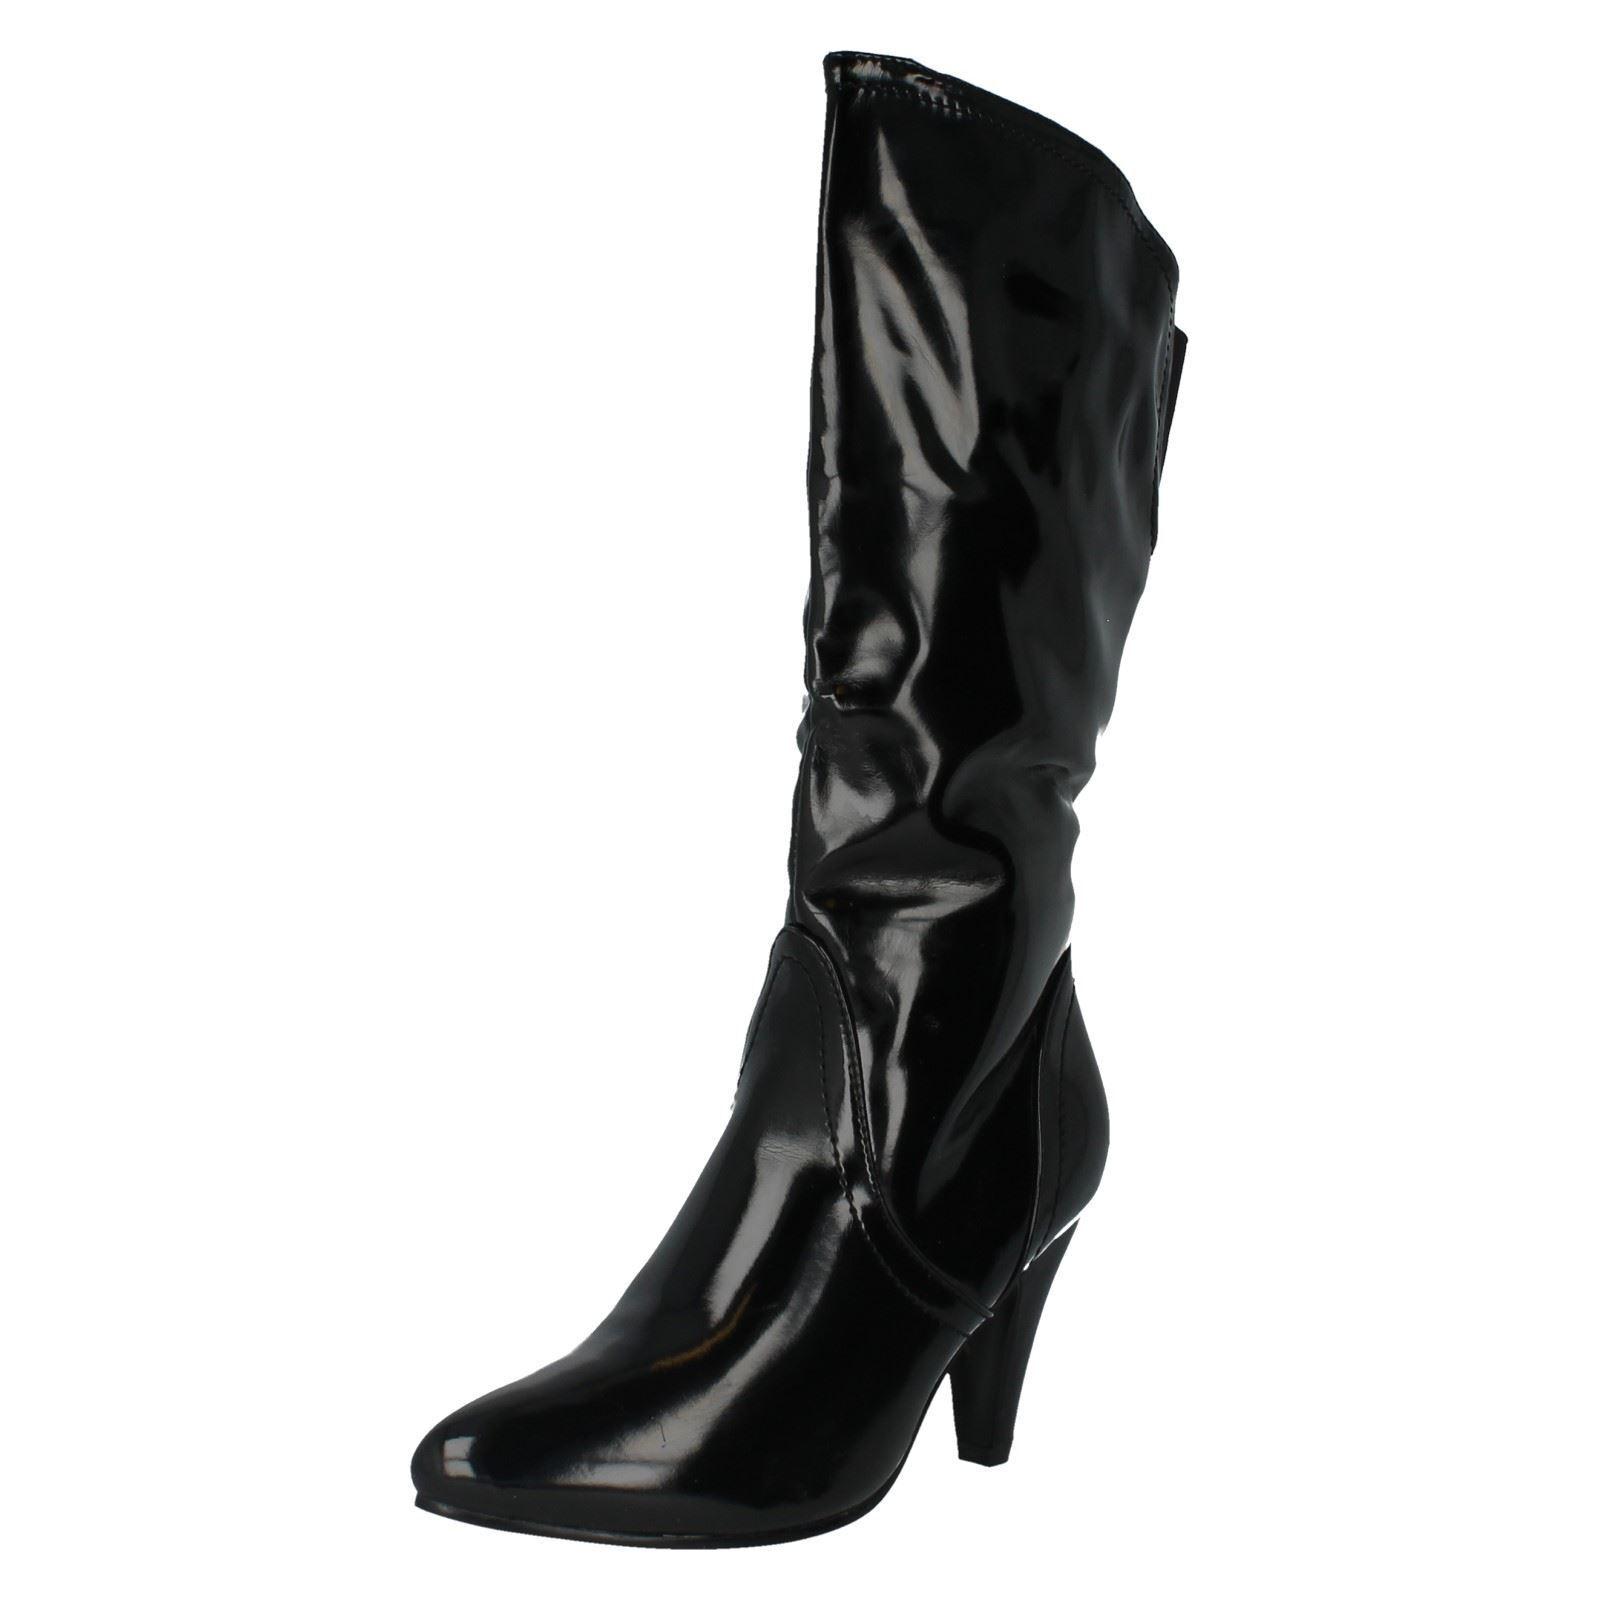 LADIES SPOT ON BLACK PATENT MID CALF HEELED BOOT STYLE - F5677 UK 5